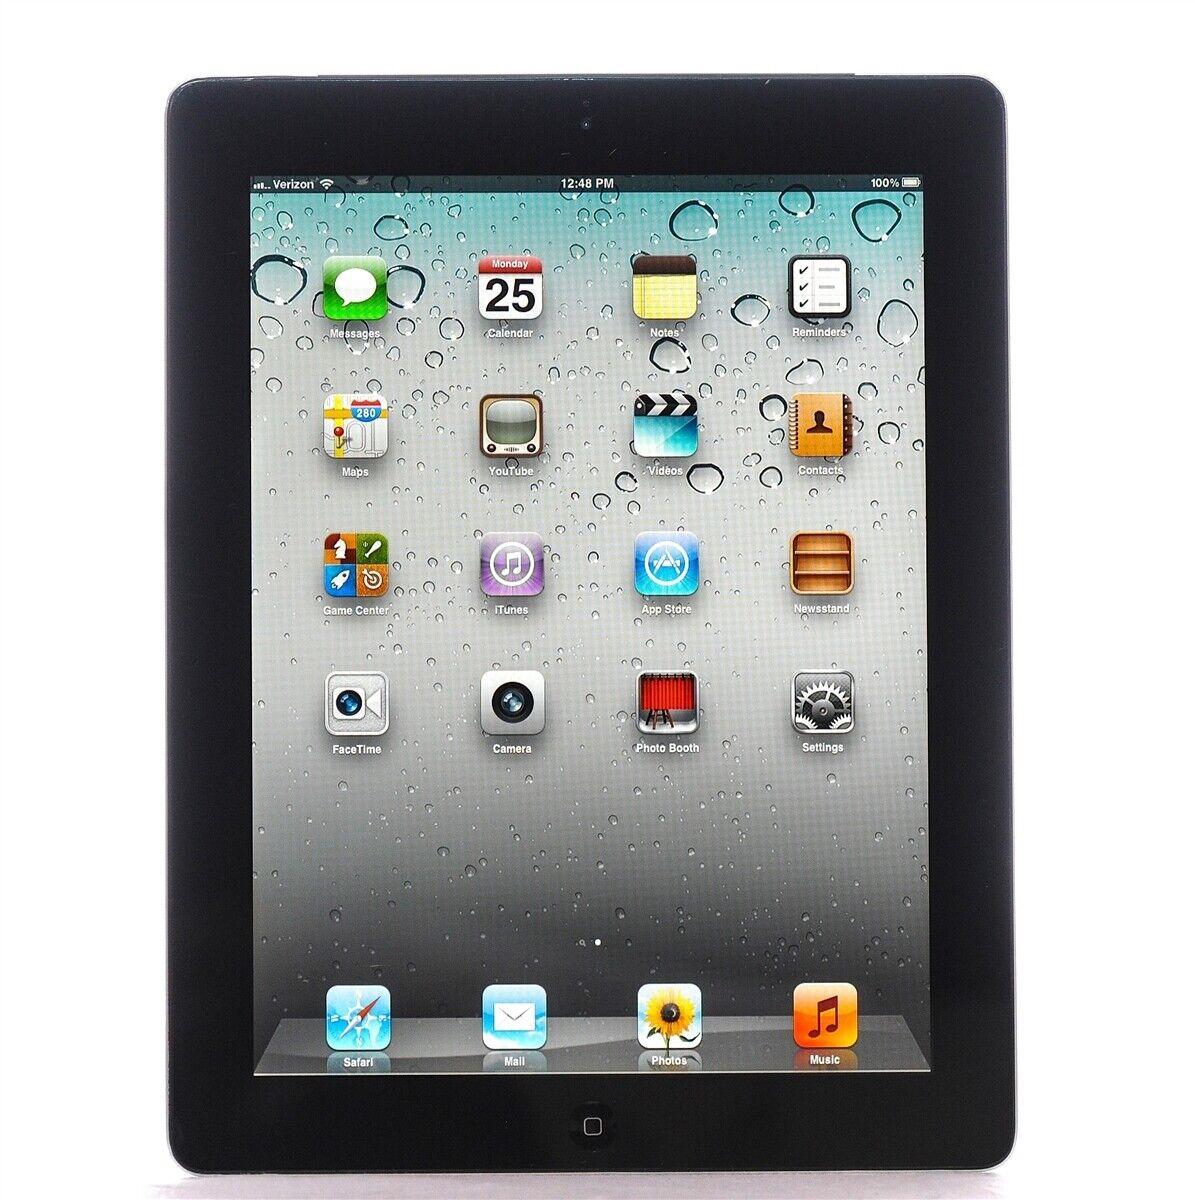 Apple iPad 4th Gen. 128GB, Wi-Fi, 9.7in - Black - Tested - Bundle A1458